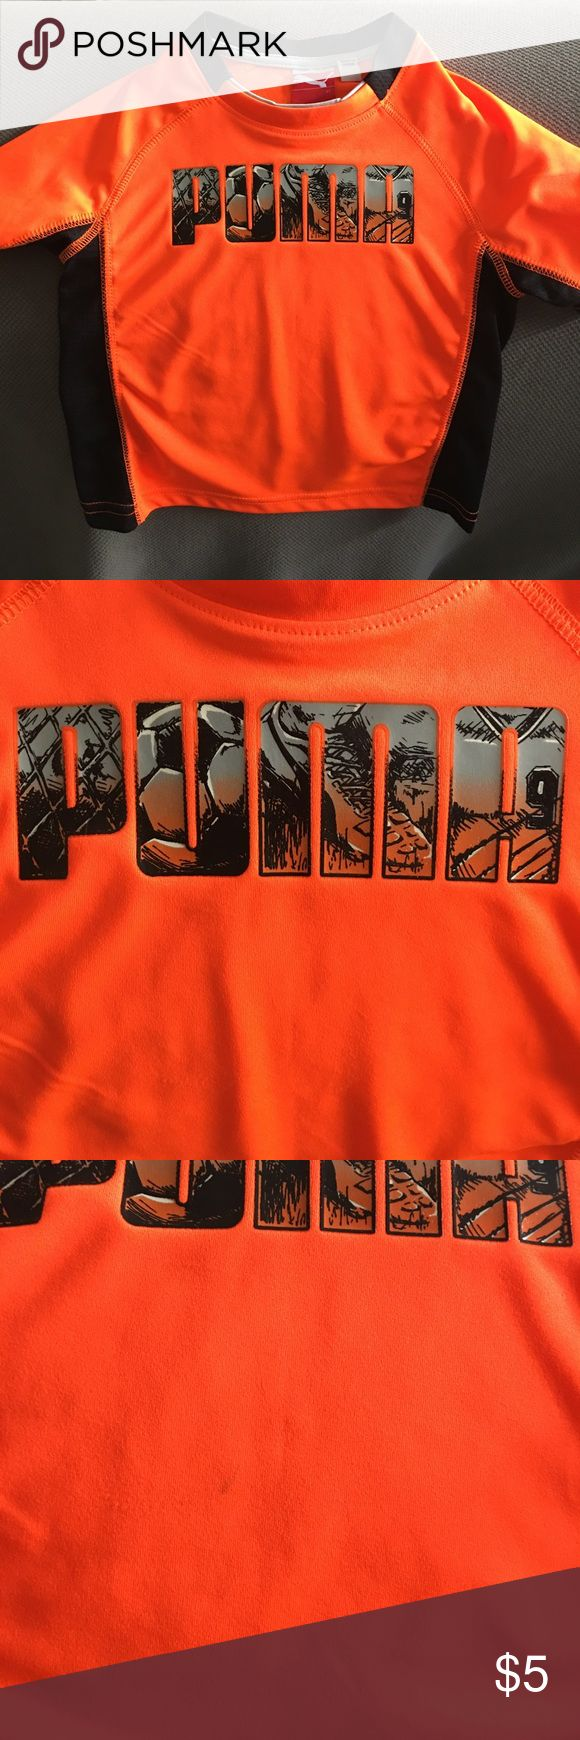 Soccer Puma Shirt Soccer Puma Shirt. Small stain on front. Puma Shirts & Tops Tees - Short Sleeve